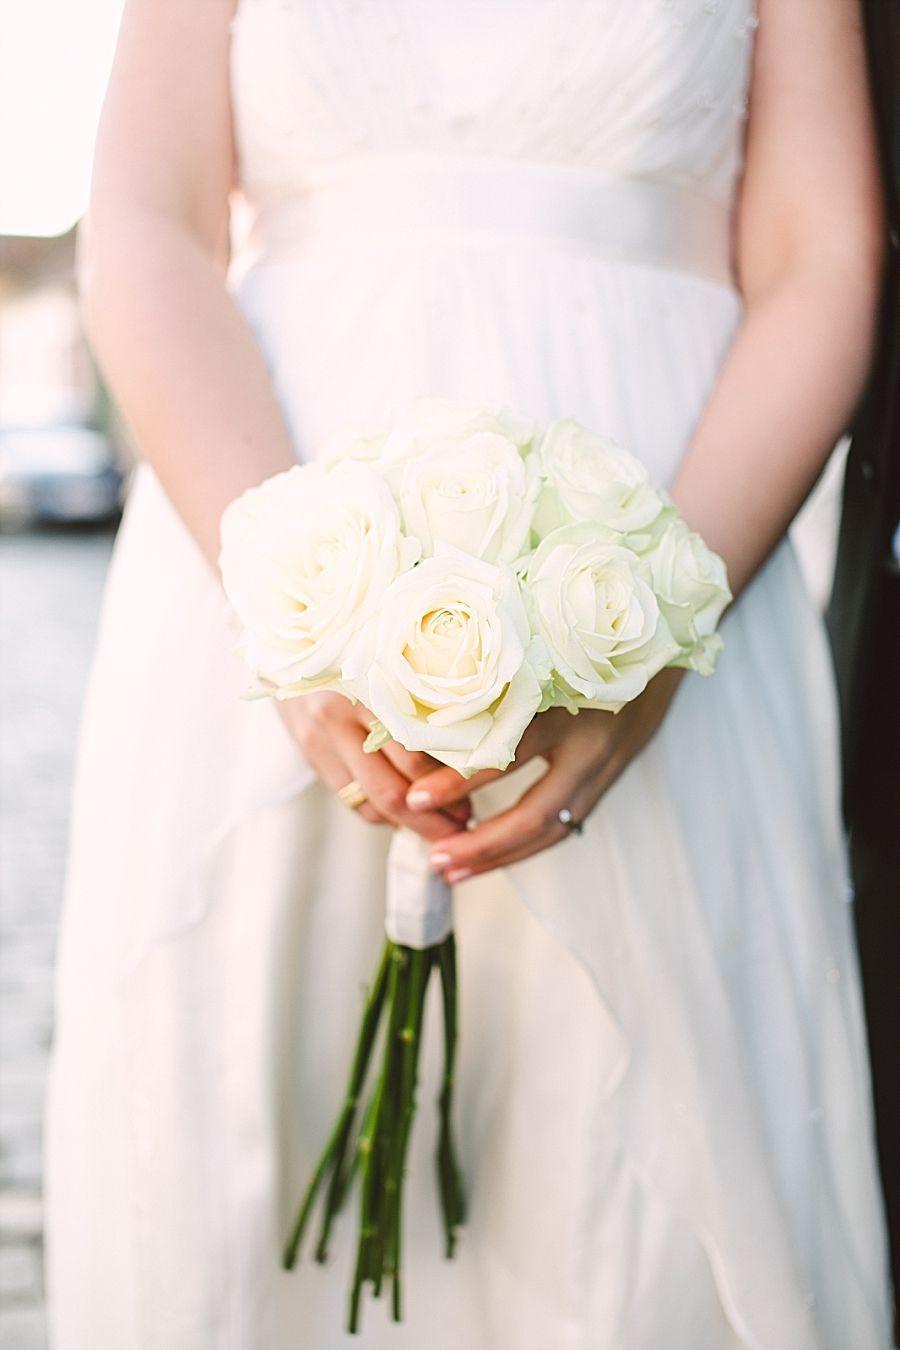 simple long-stemmed bouquet of white roses | Wedding festiveness ...